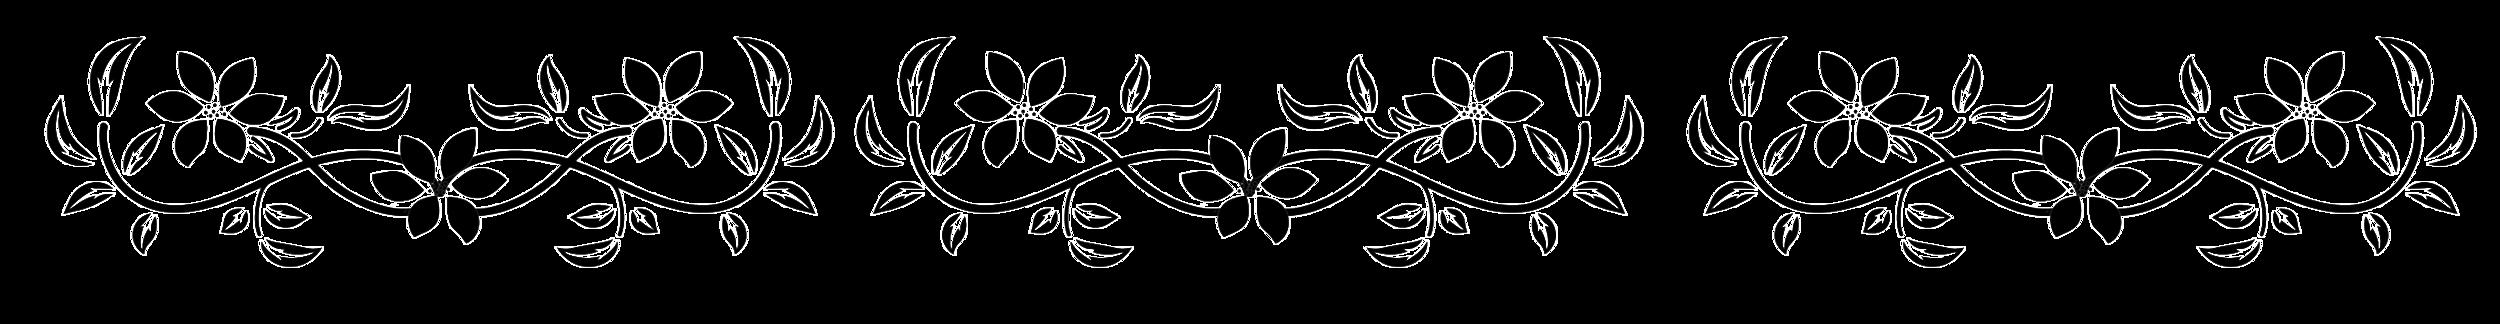 black-and-white-flower-border.png